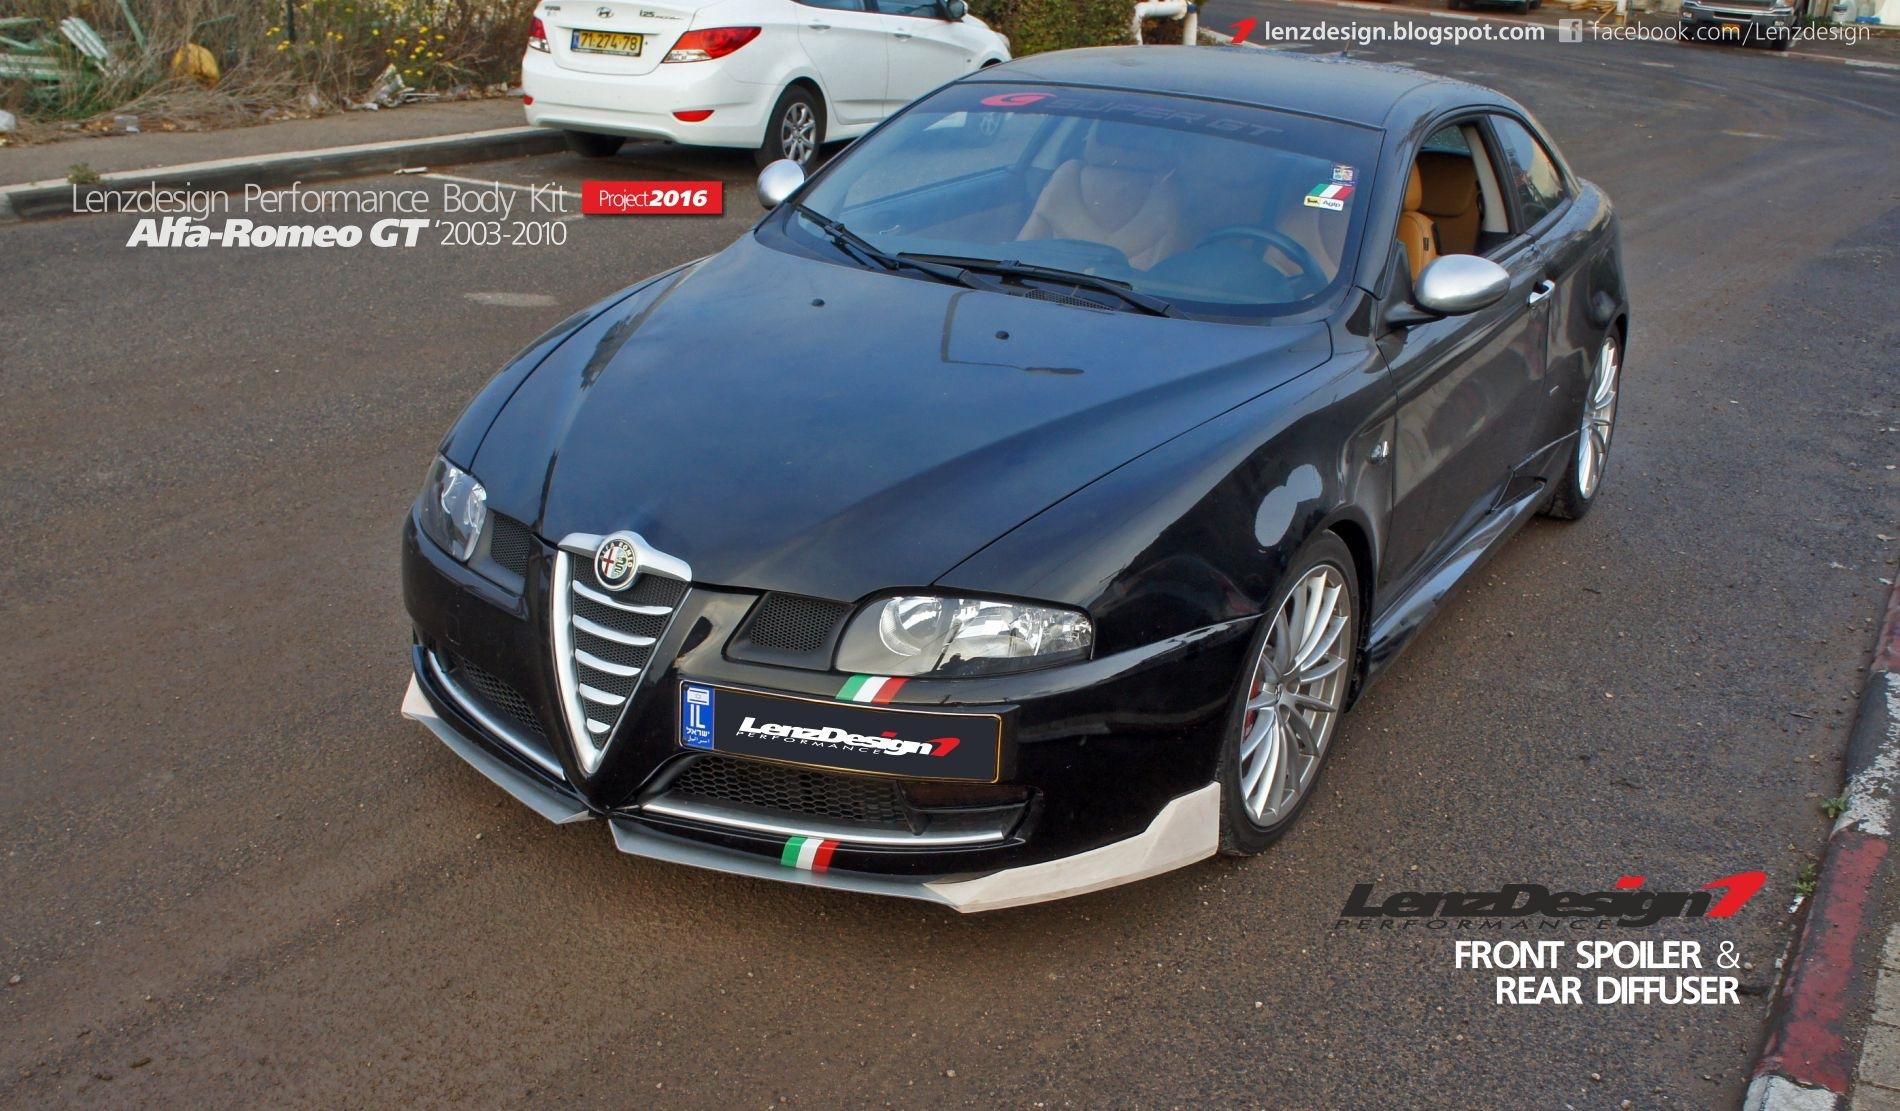 \u0422\u044e\u043d\u0438\u043d\u0433 Alfa Romeo GT \u2014 Front Spoiler \u0026 Rear Diffuser by Lenzdesign Performance \u2014 Lenzdesign